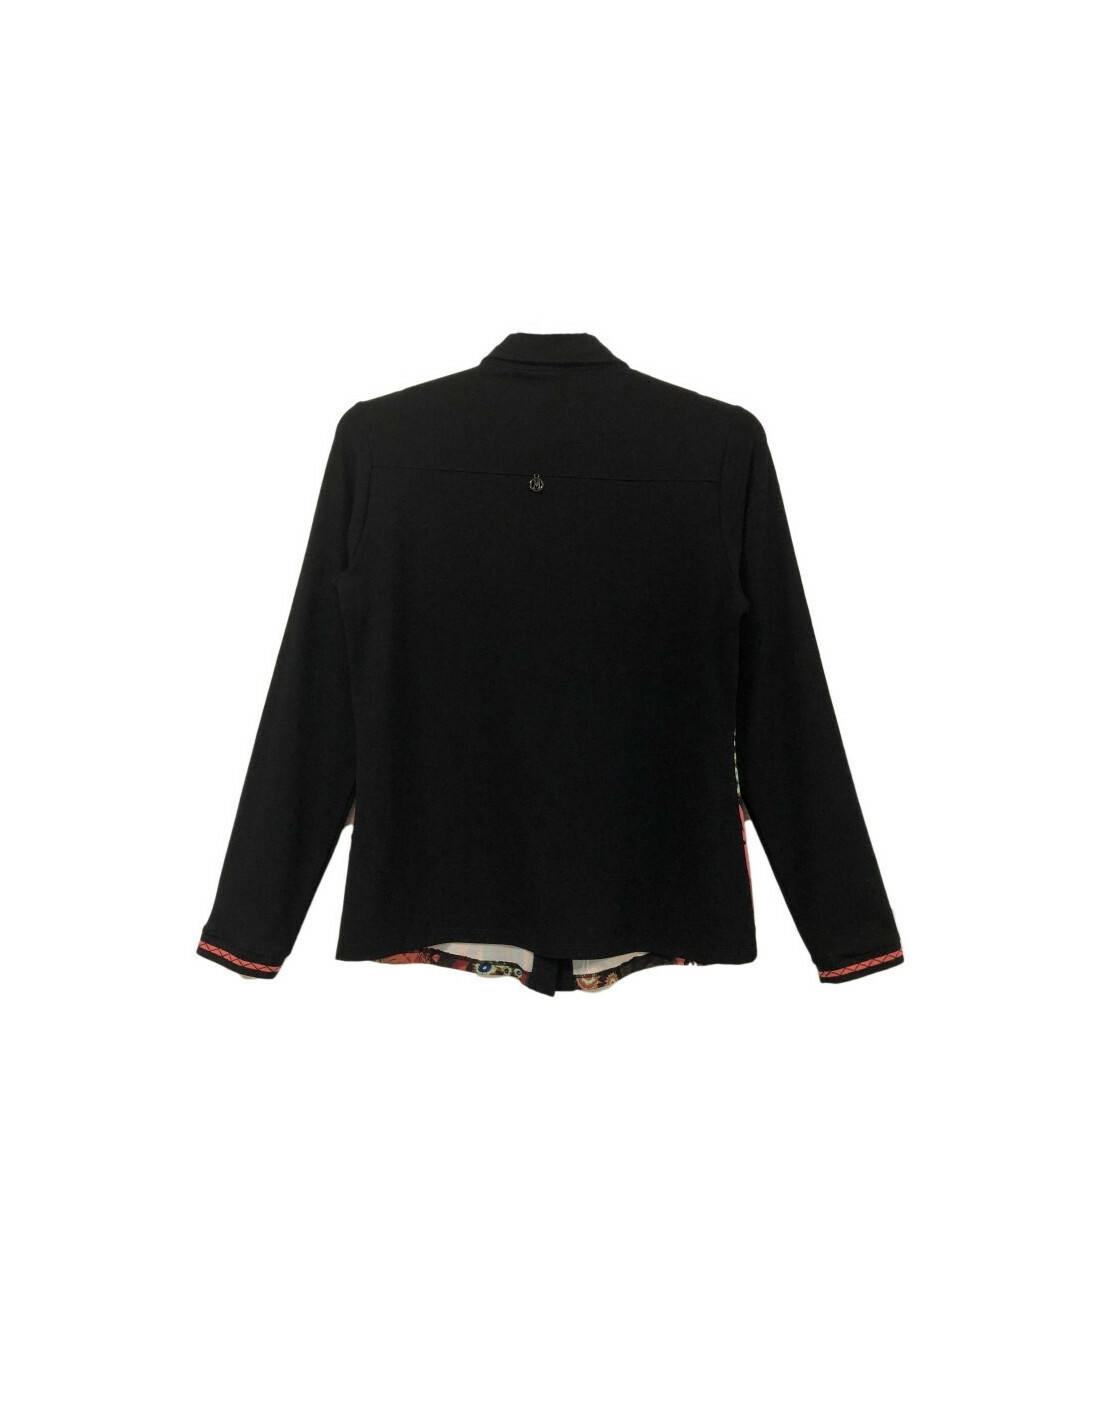 Maloka: Sedona Rock Art Buttoned Down Shirt (2 Left!)